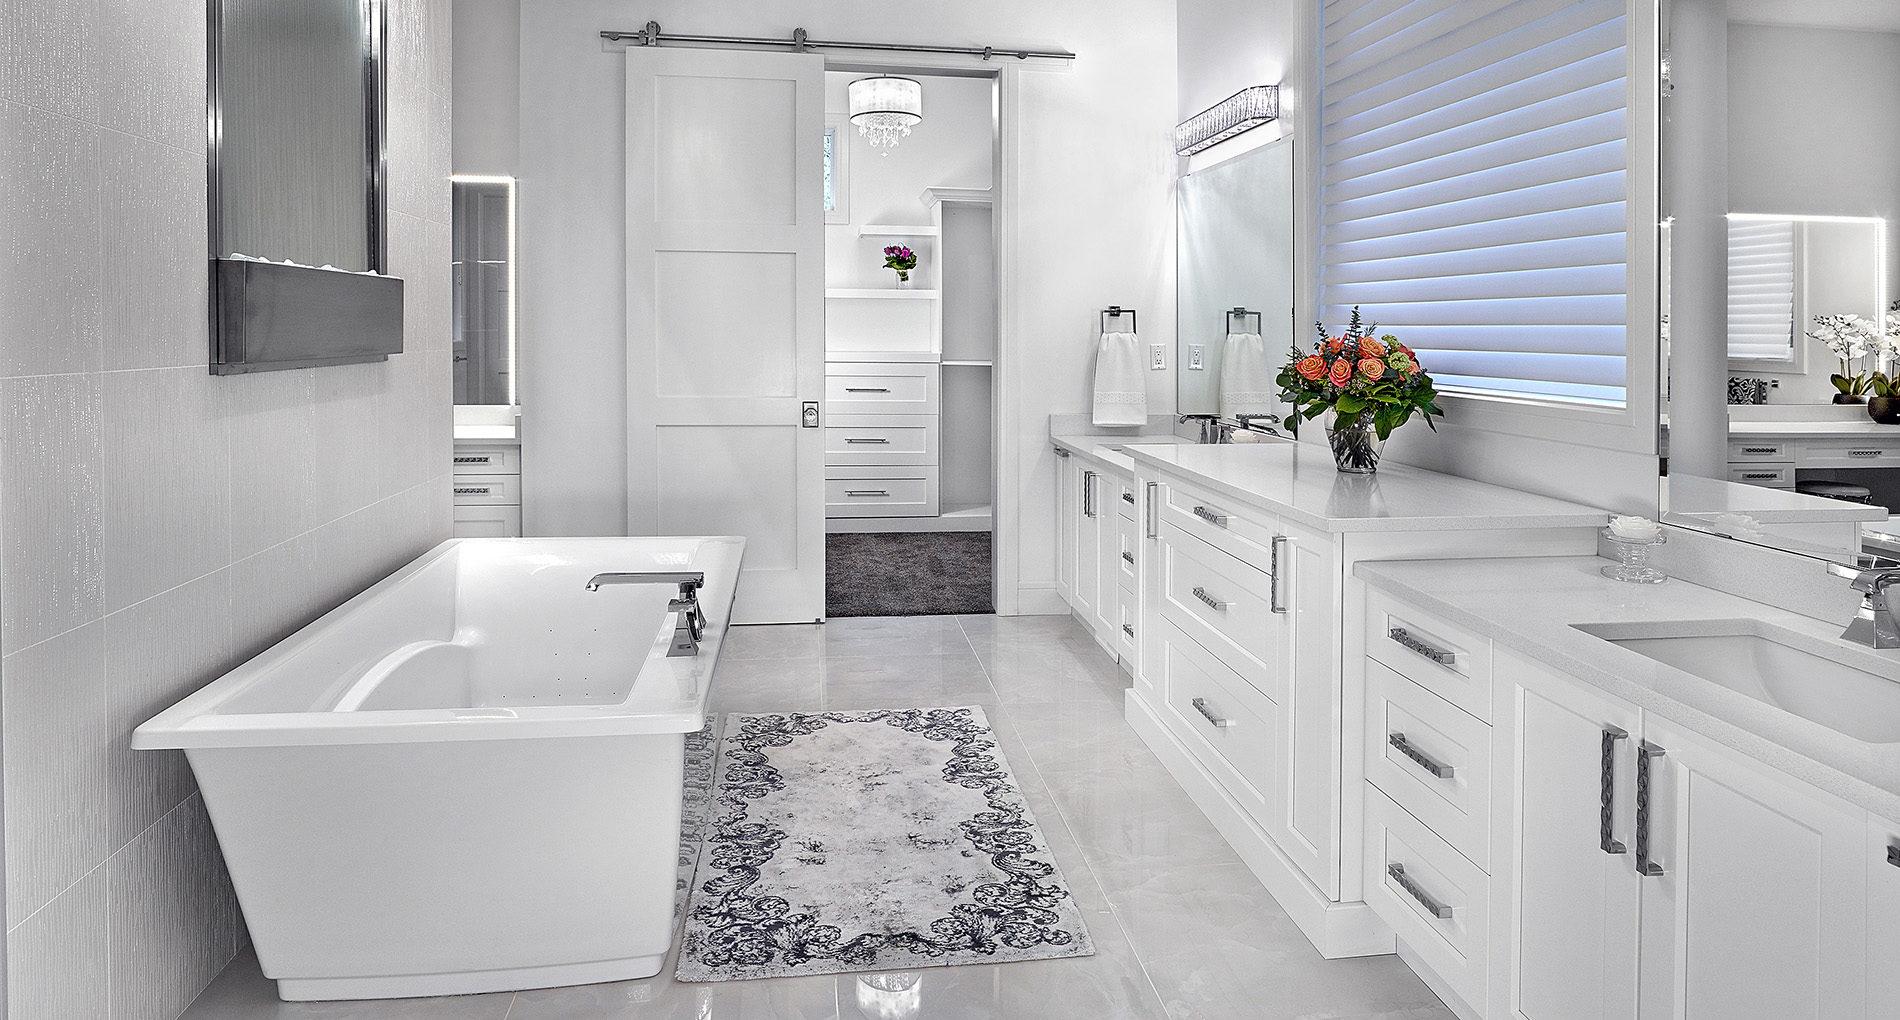 Bathroom Remodeling  Design in Greensboro  Alair Homes